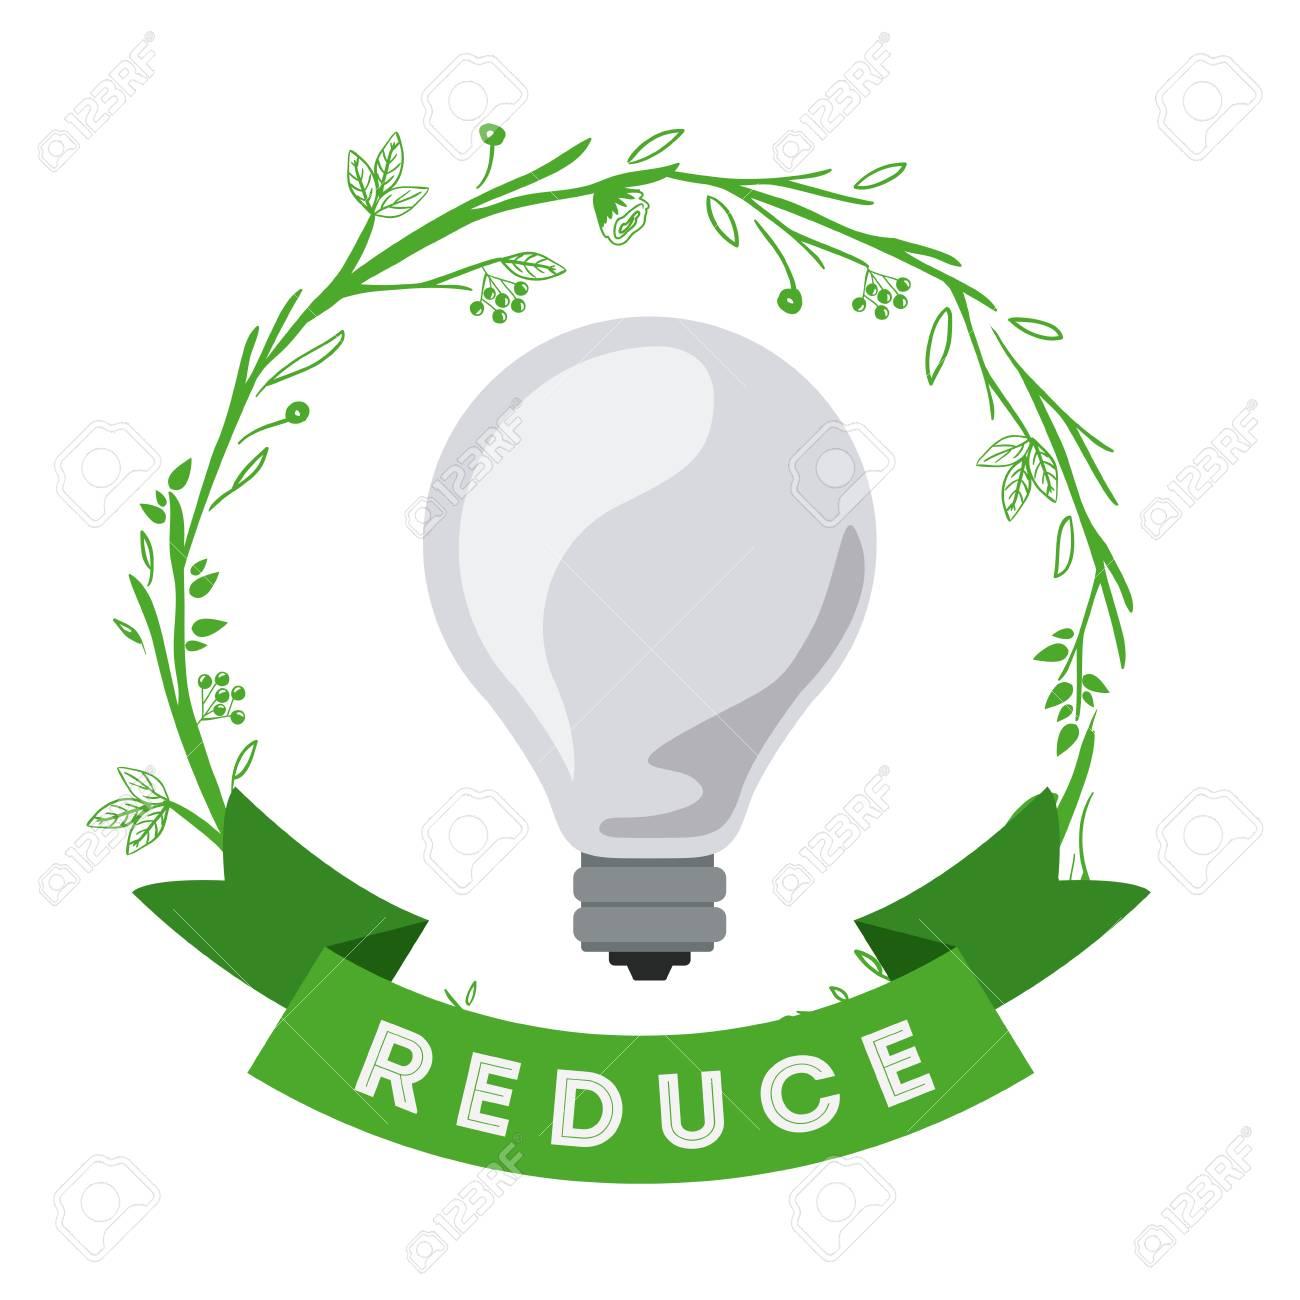 eco friendly ideas design, vector illustration eps10 graphic